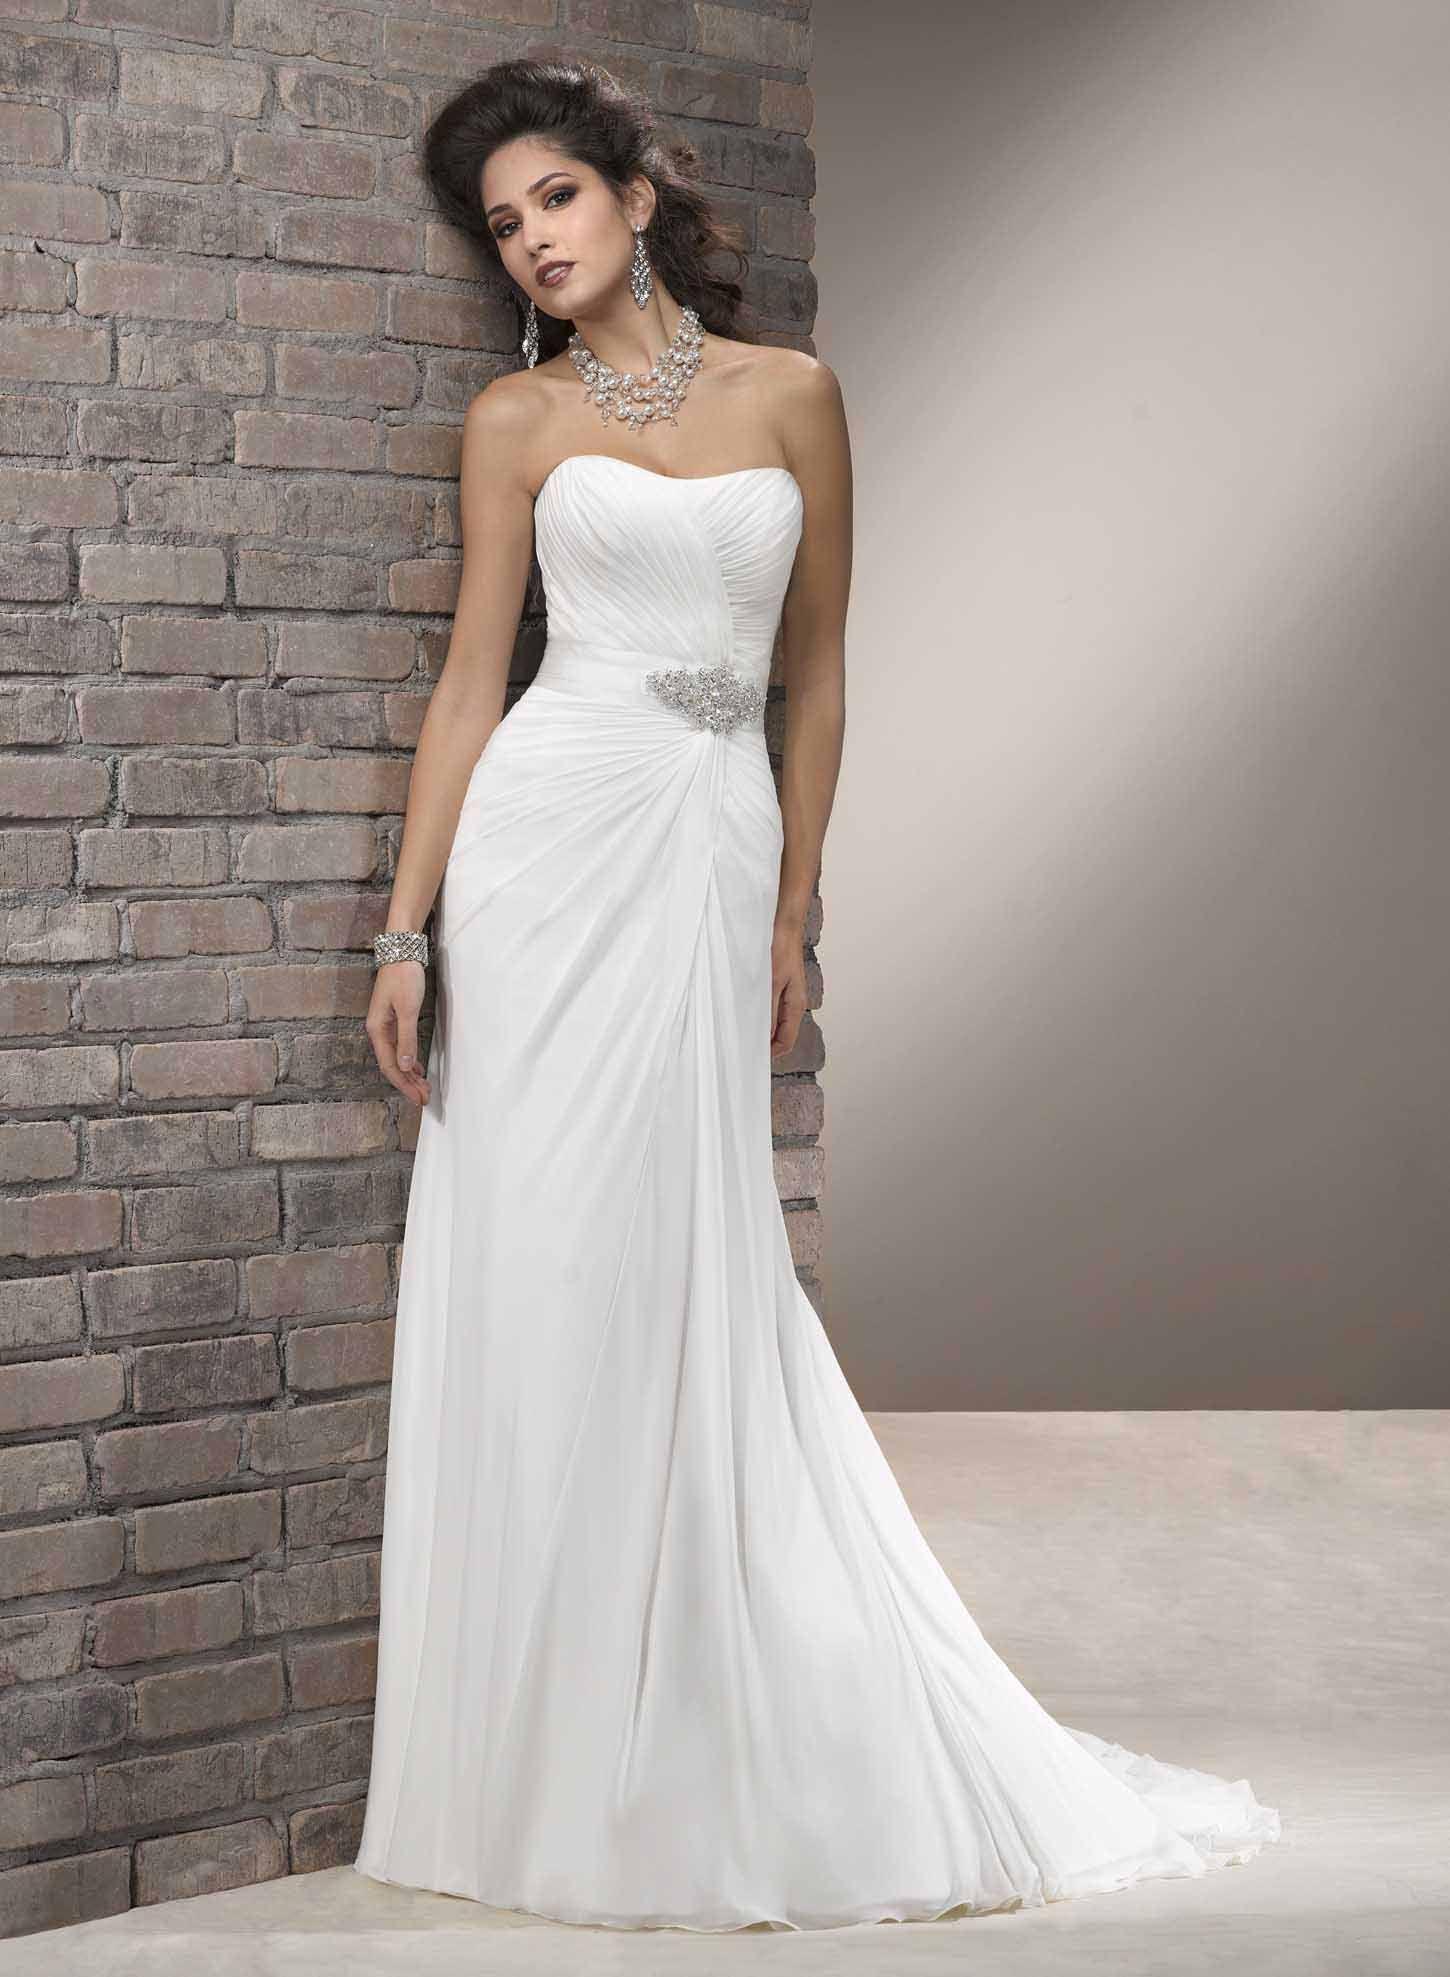 Wedding Summer Wedding Dresses 72 best ideas about wedding dresses on pinterest summer expensive dress and brides